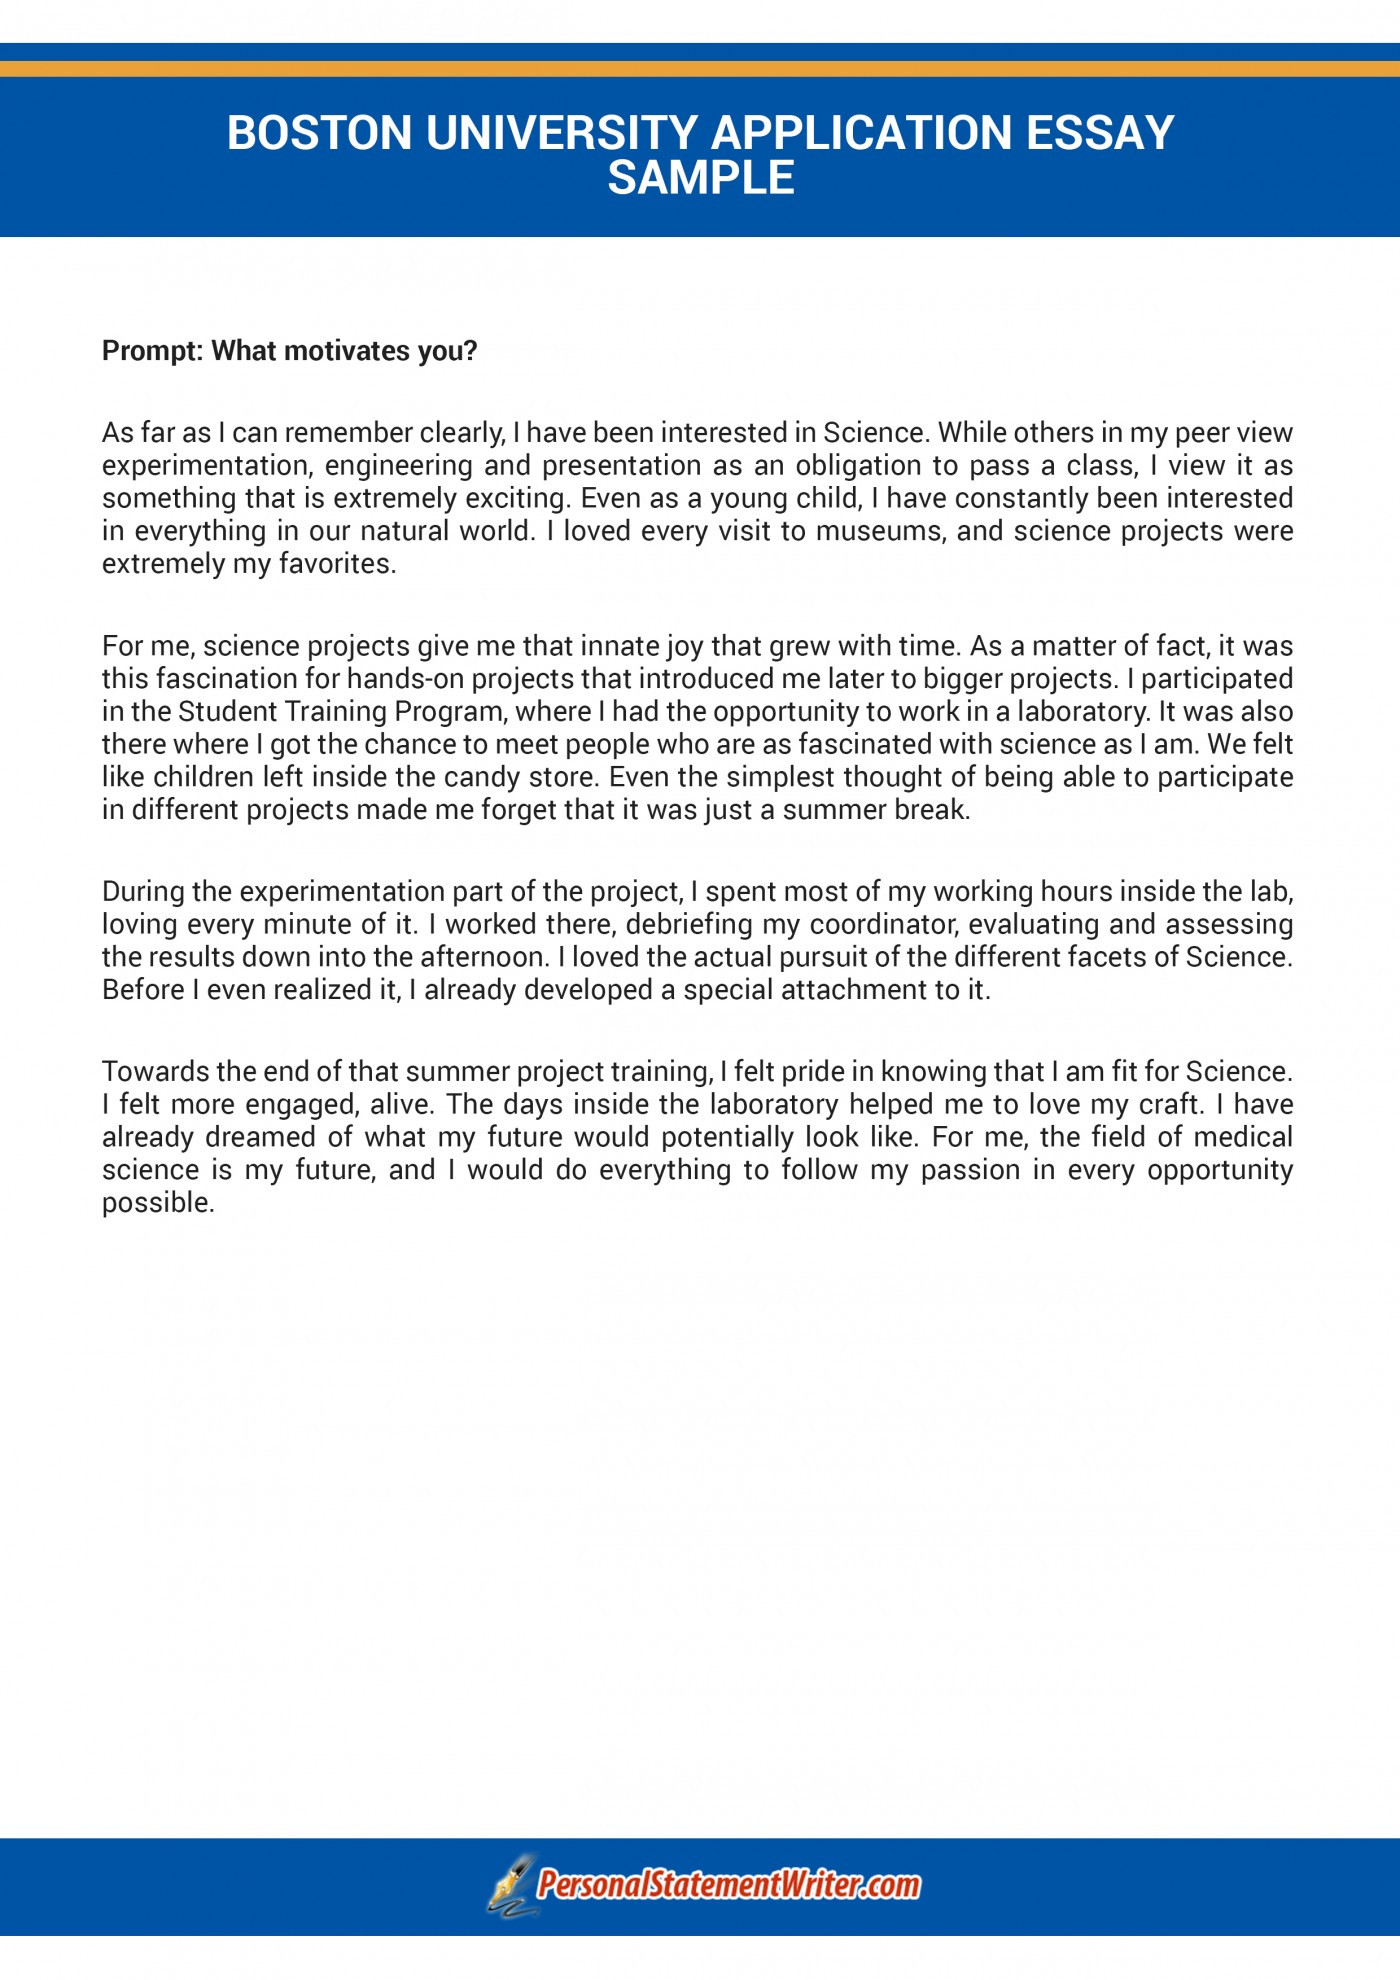 018 Essay Example Fit Boston Sensational Deadline Advertising And Marketing Fashion Merchandising 1400